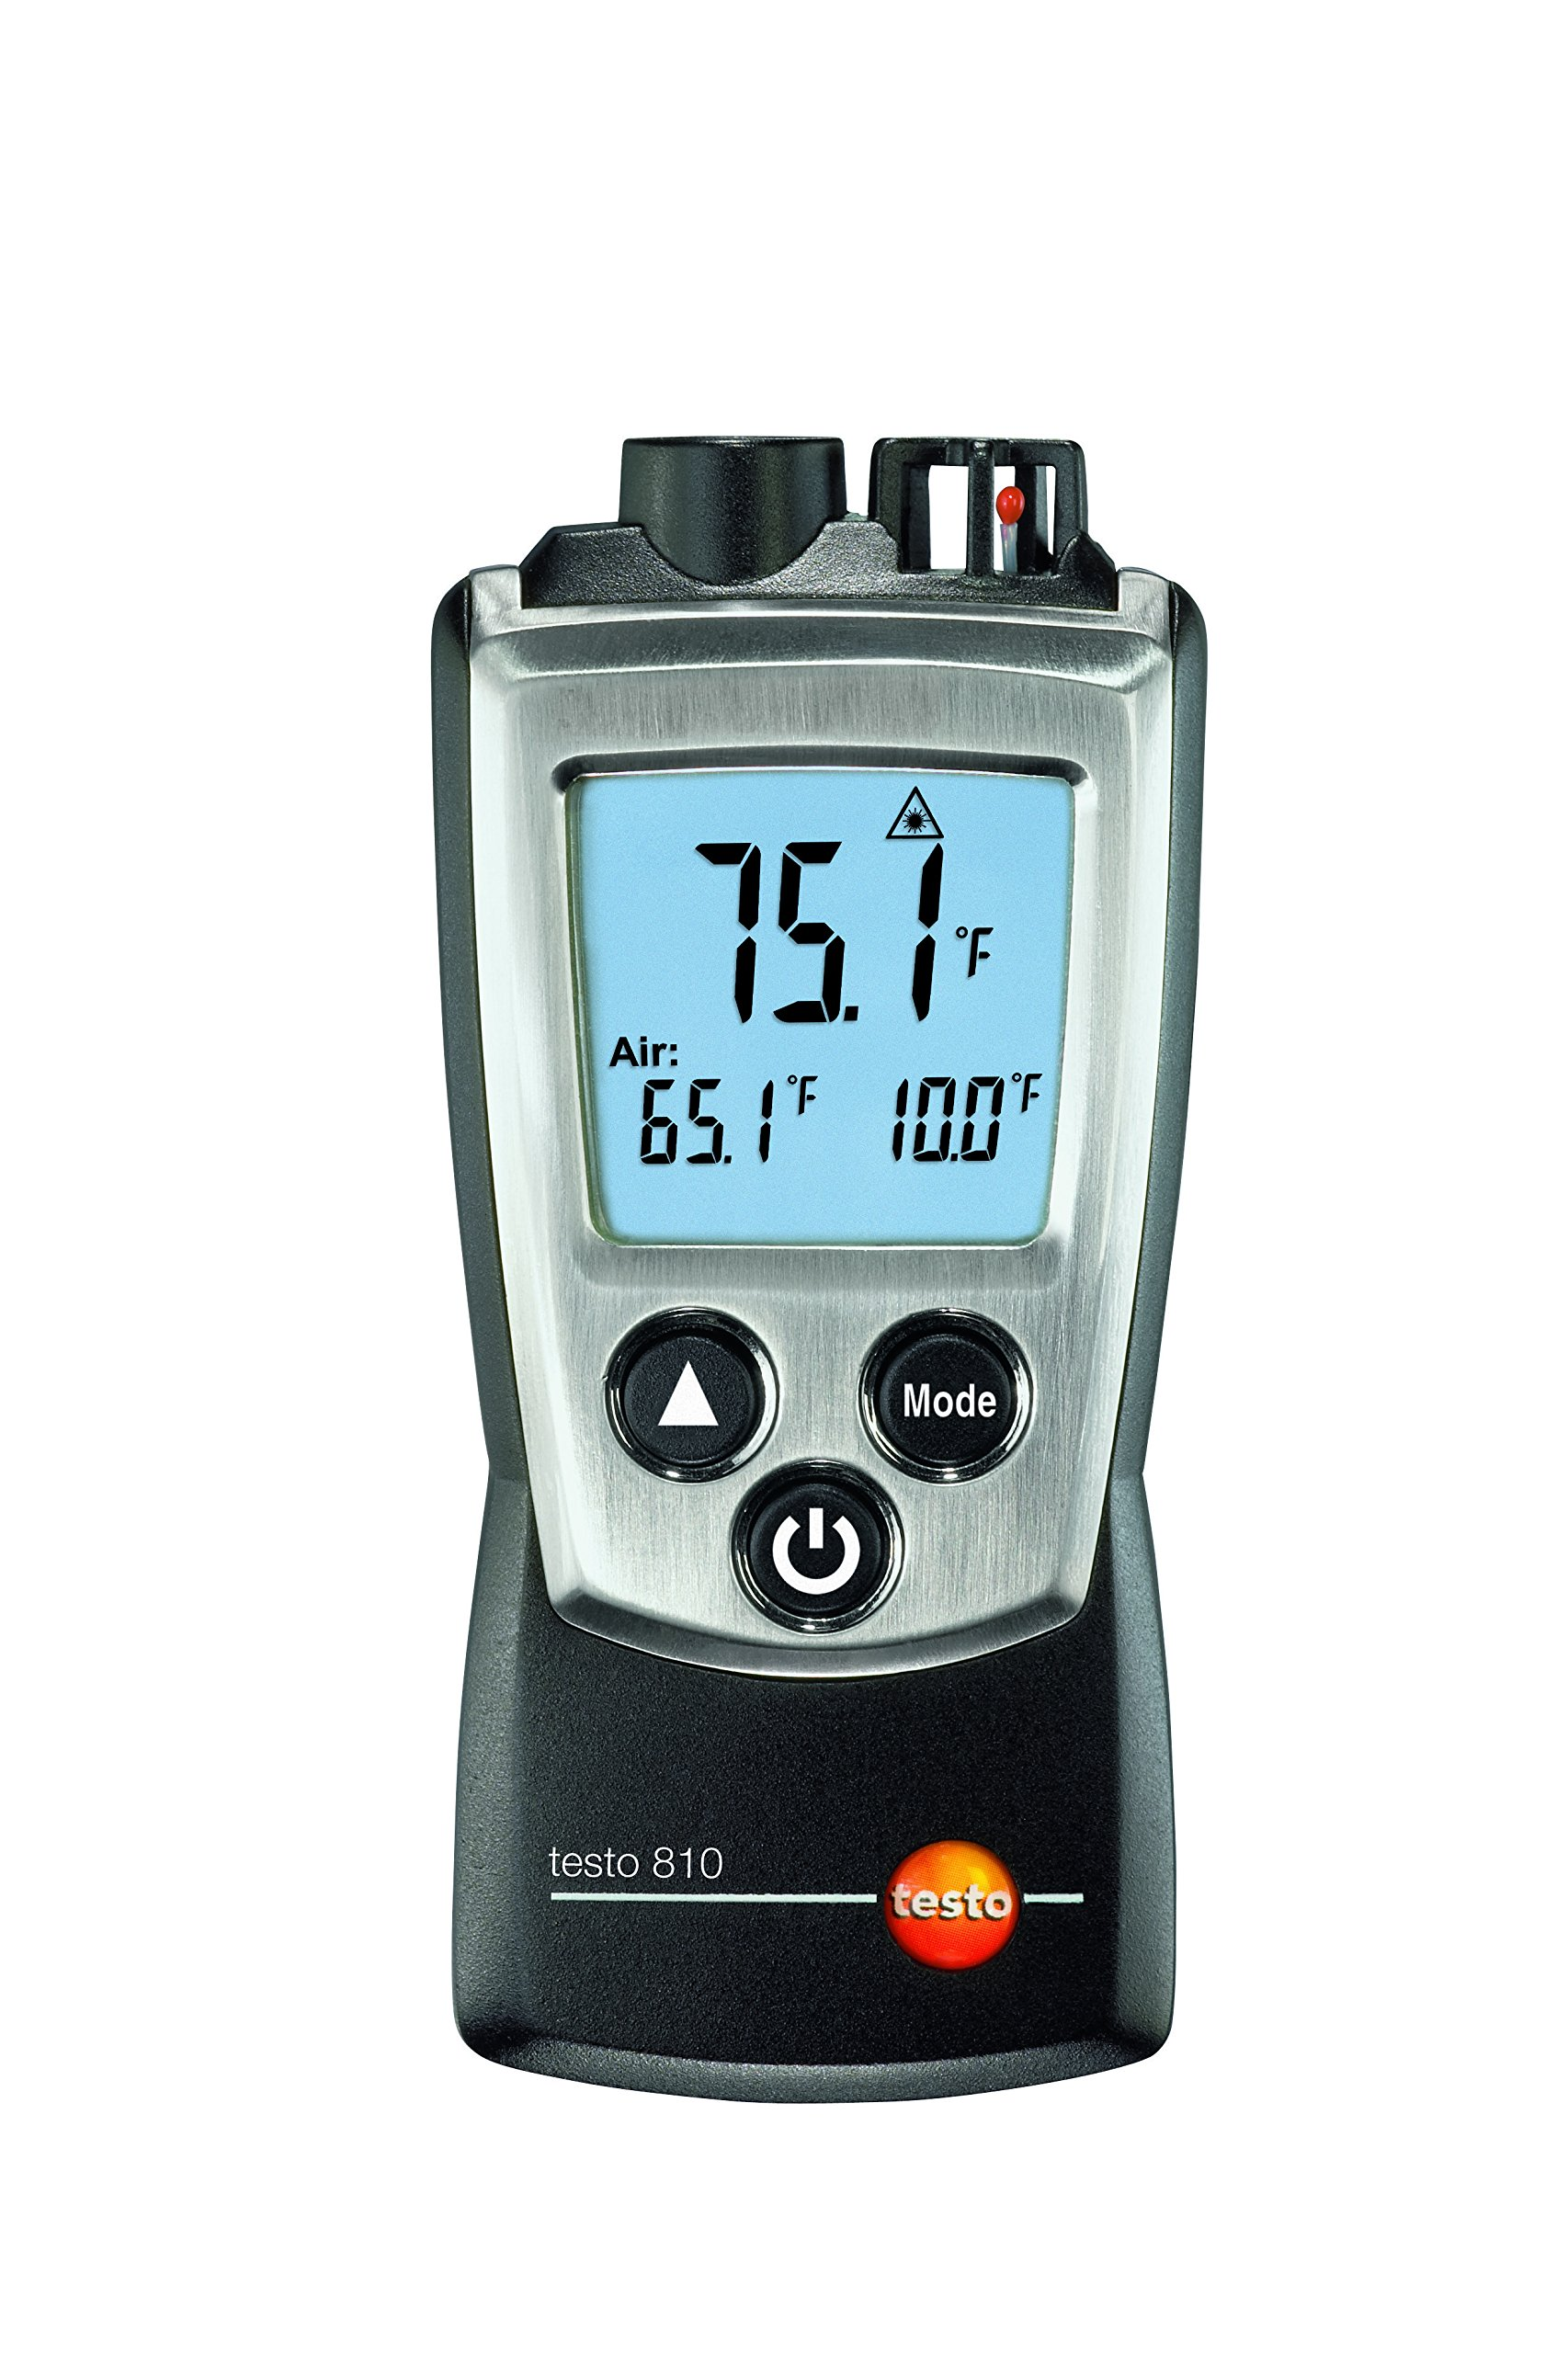 Testo 810 Pocket Pro IR/ Ambient Thermometer 0560 0810